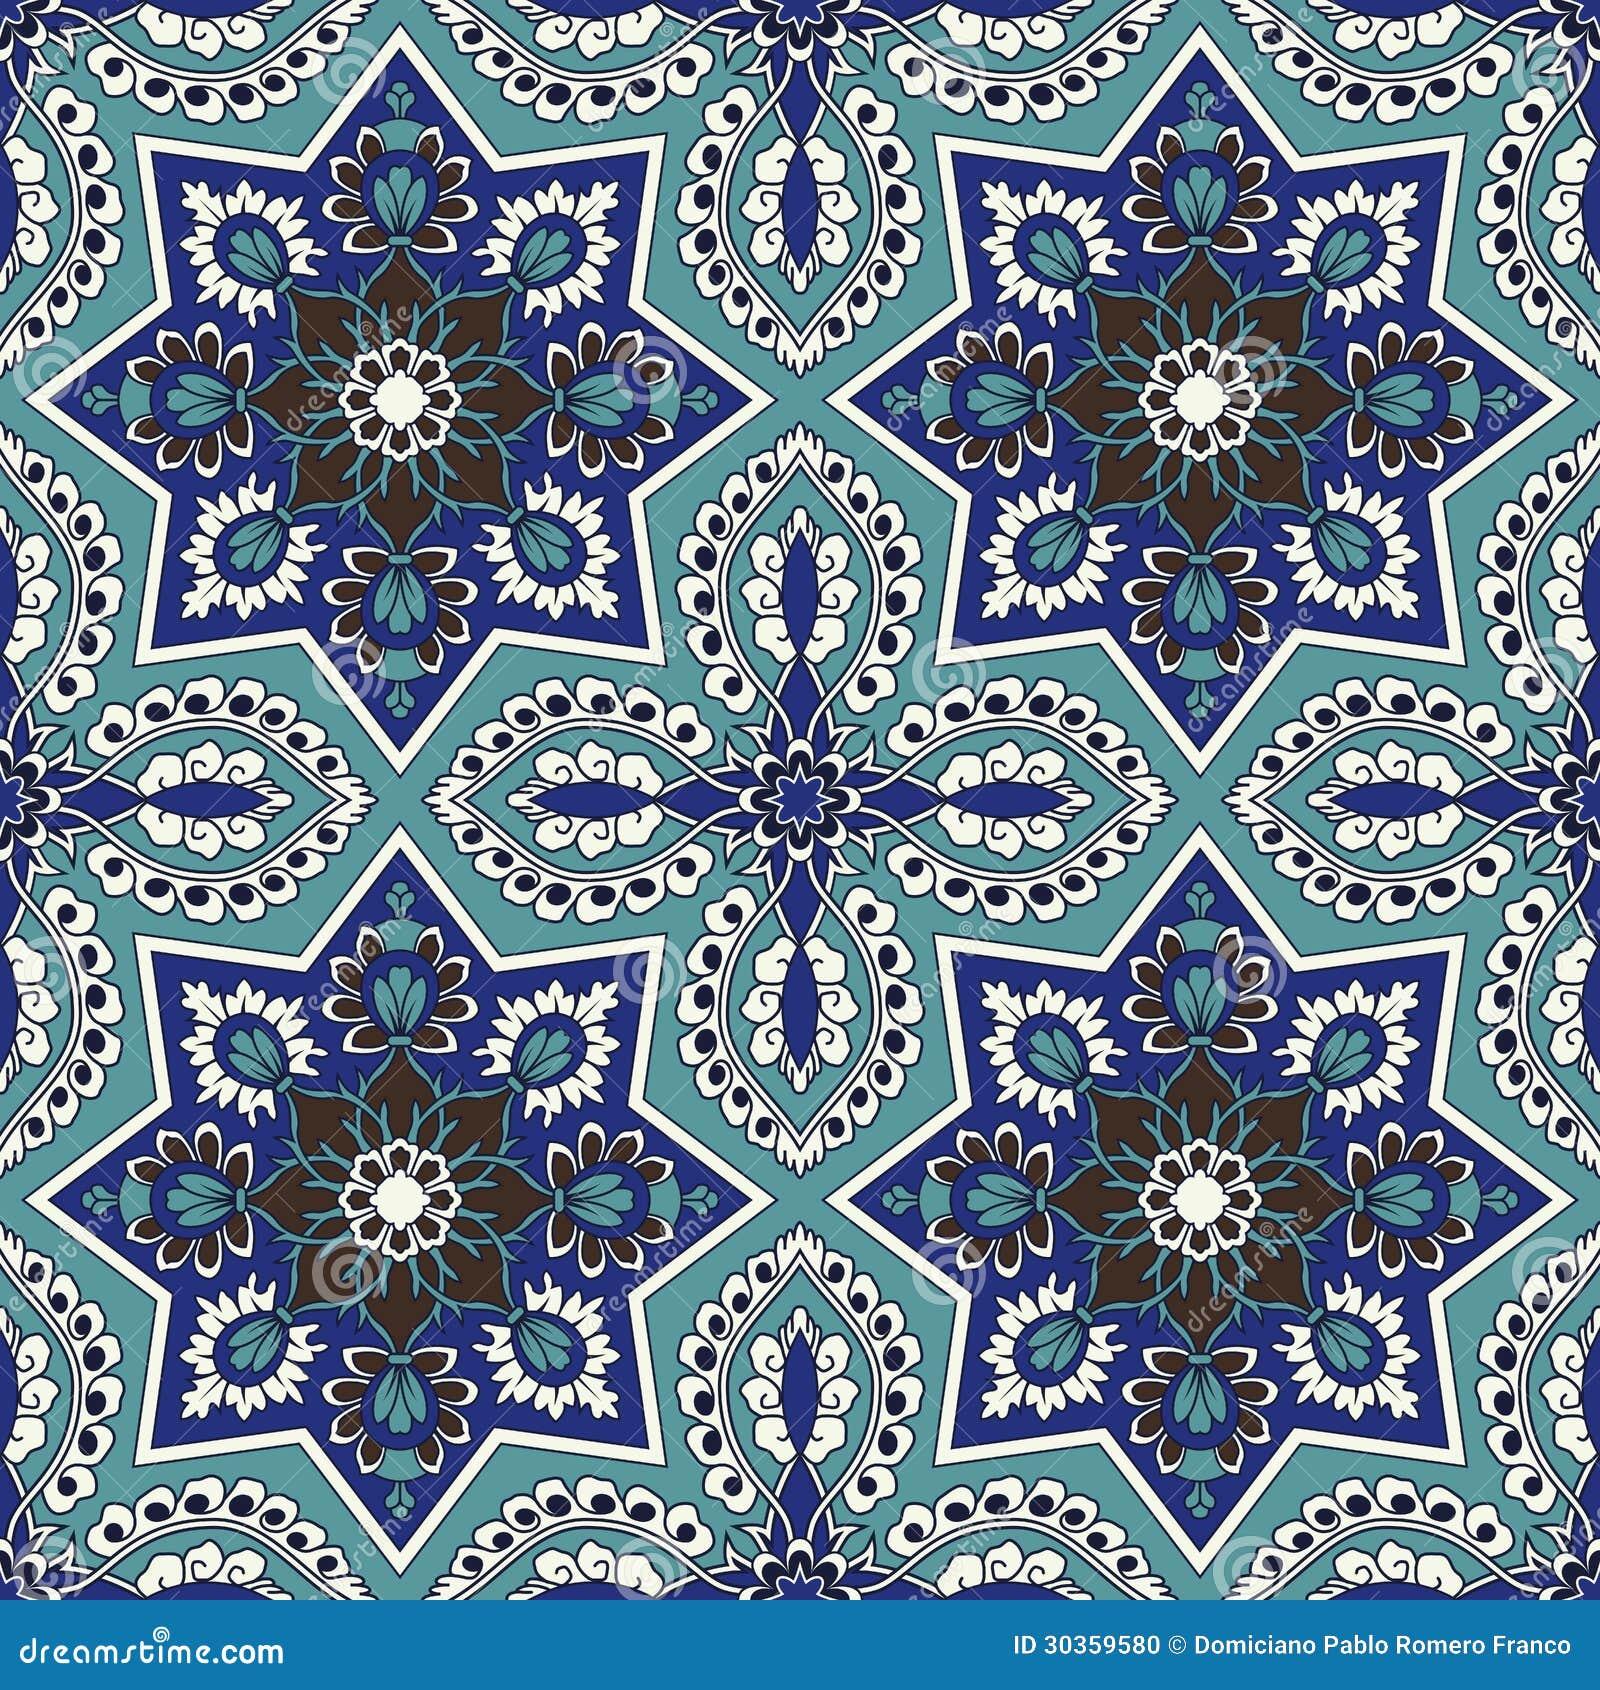 Modello senza cuciture di arabesque in blu e turchese